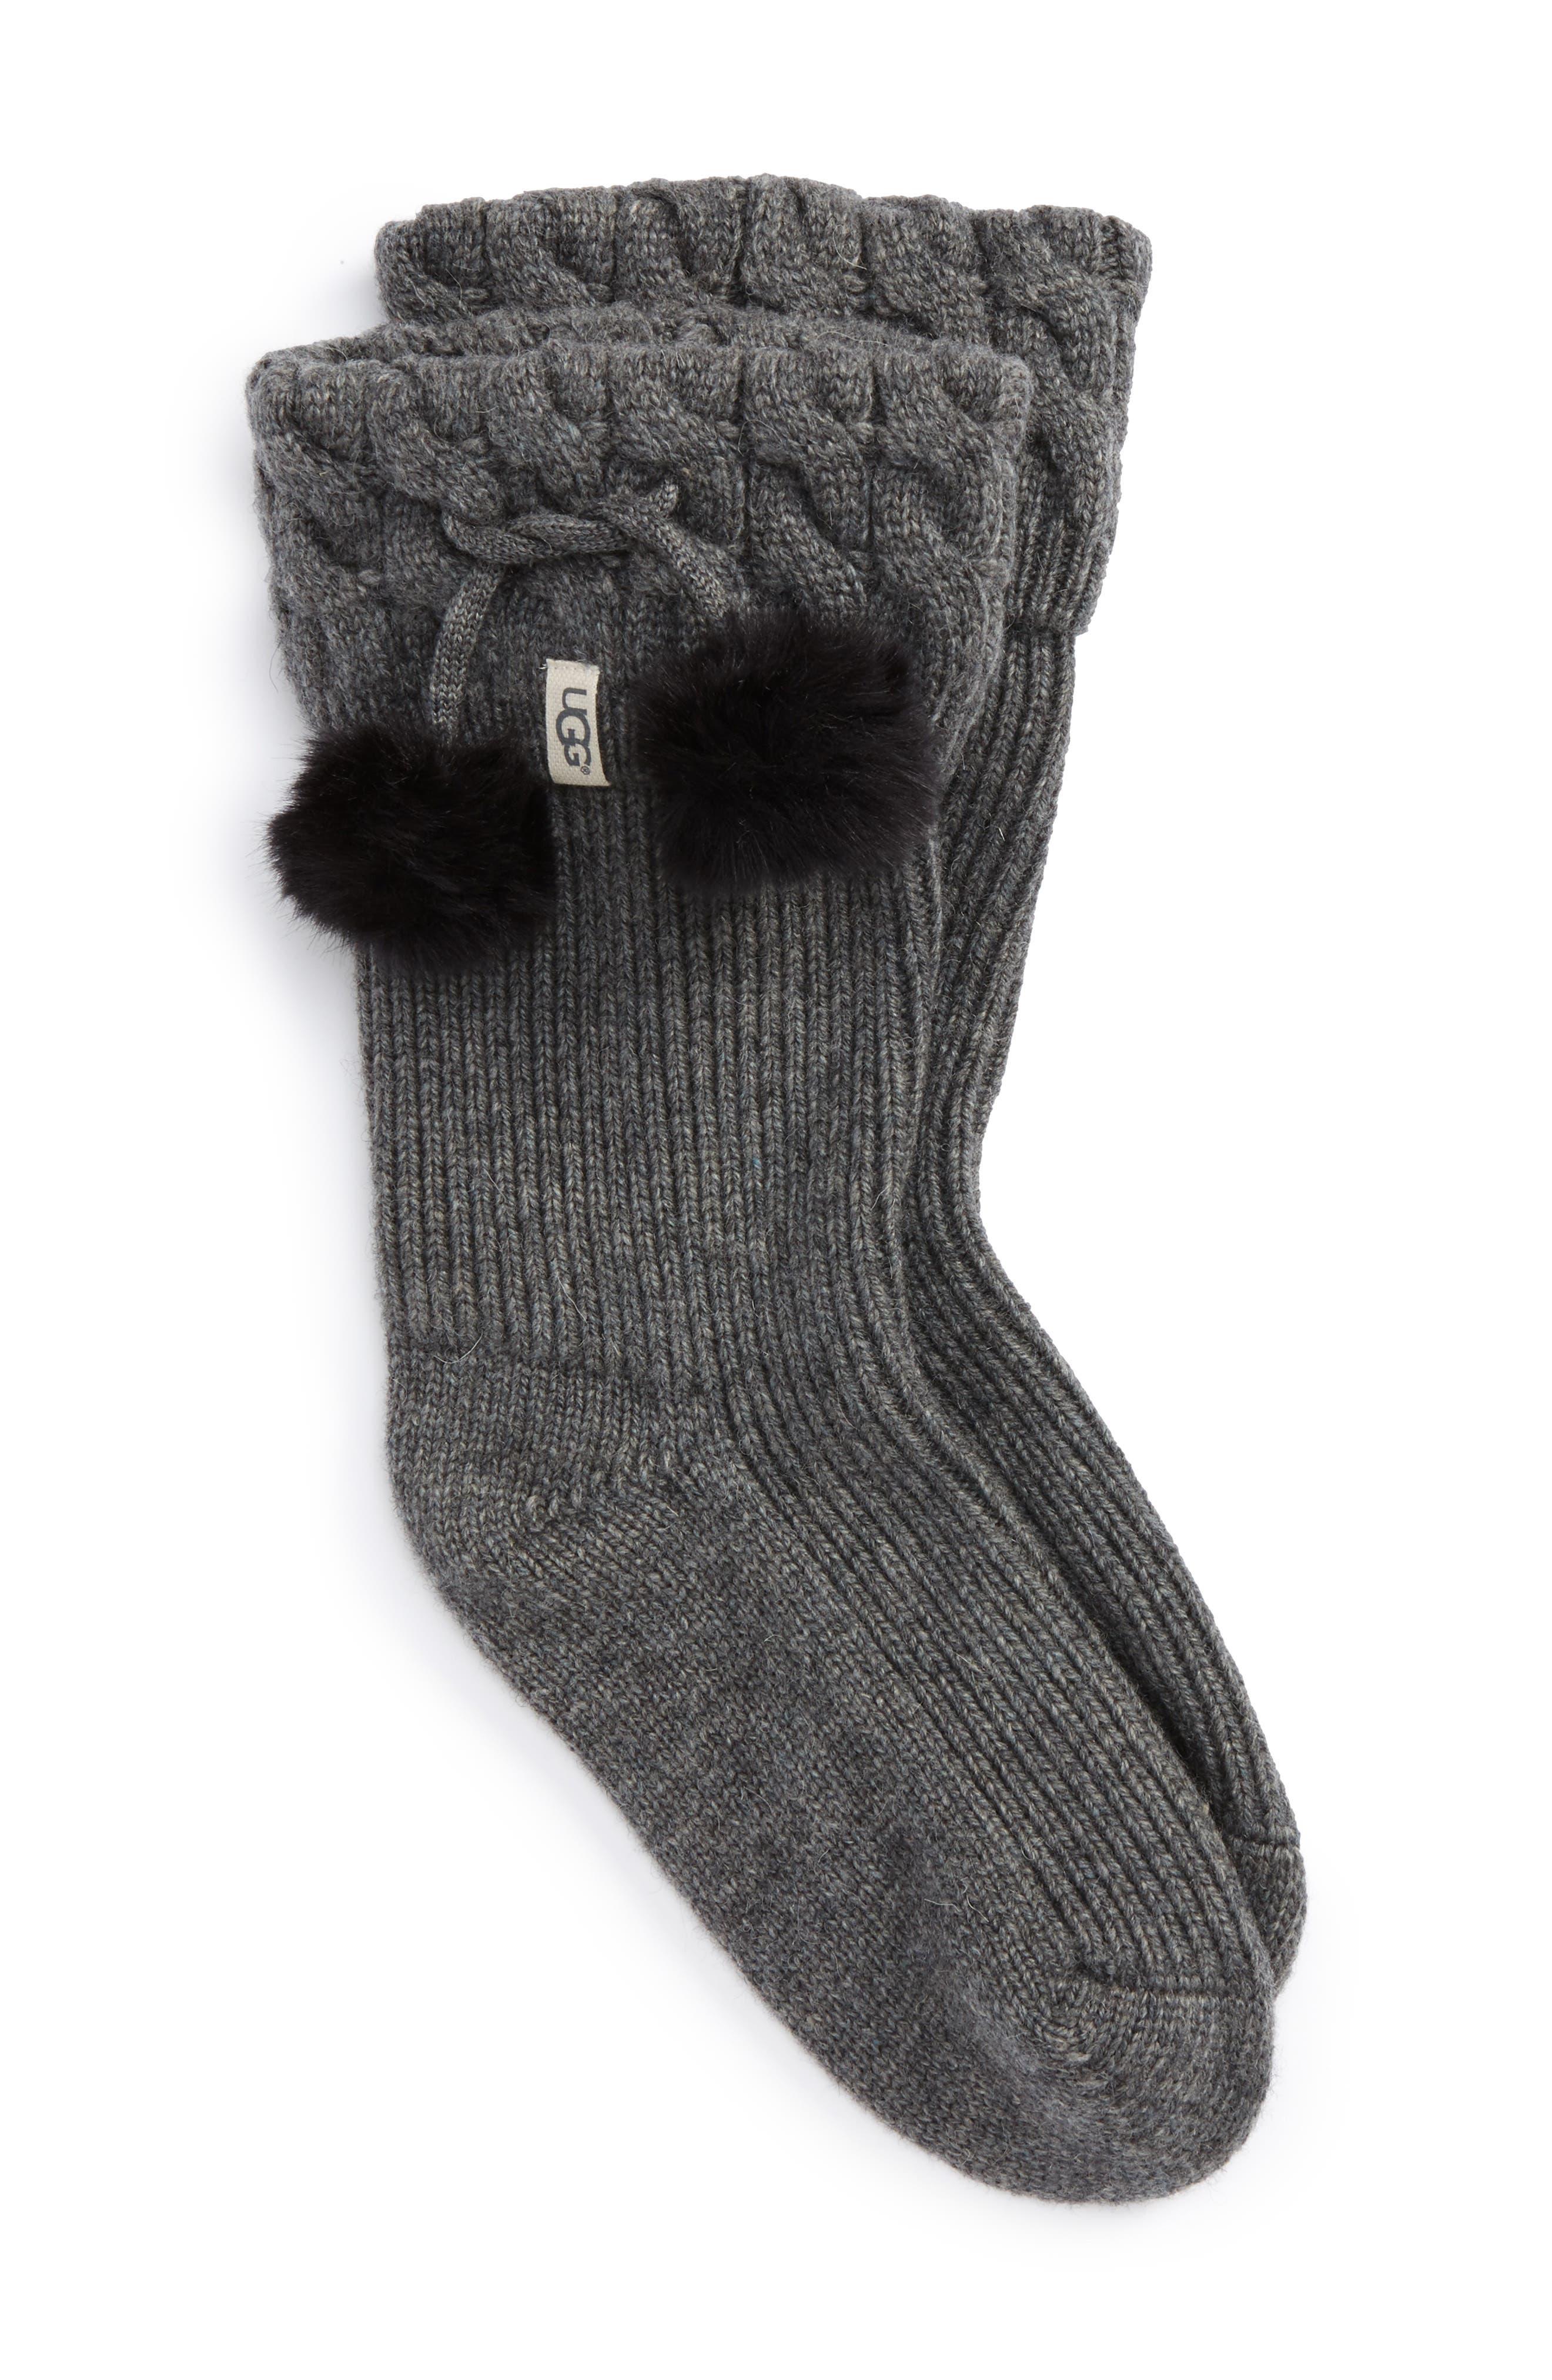 UGGpure<sup>™</sup> Pompom Short Rain Boot Sock,                             Main thumbnail 1, color,                             CHARCOAL HEATHER WOOL